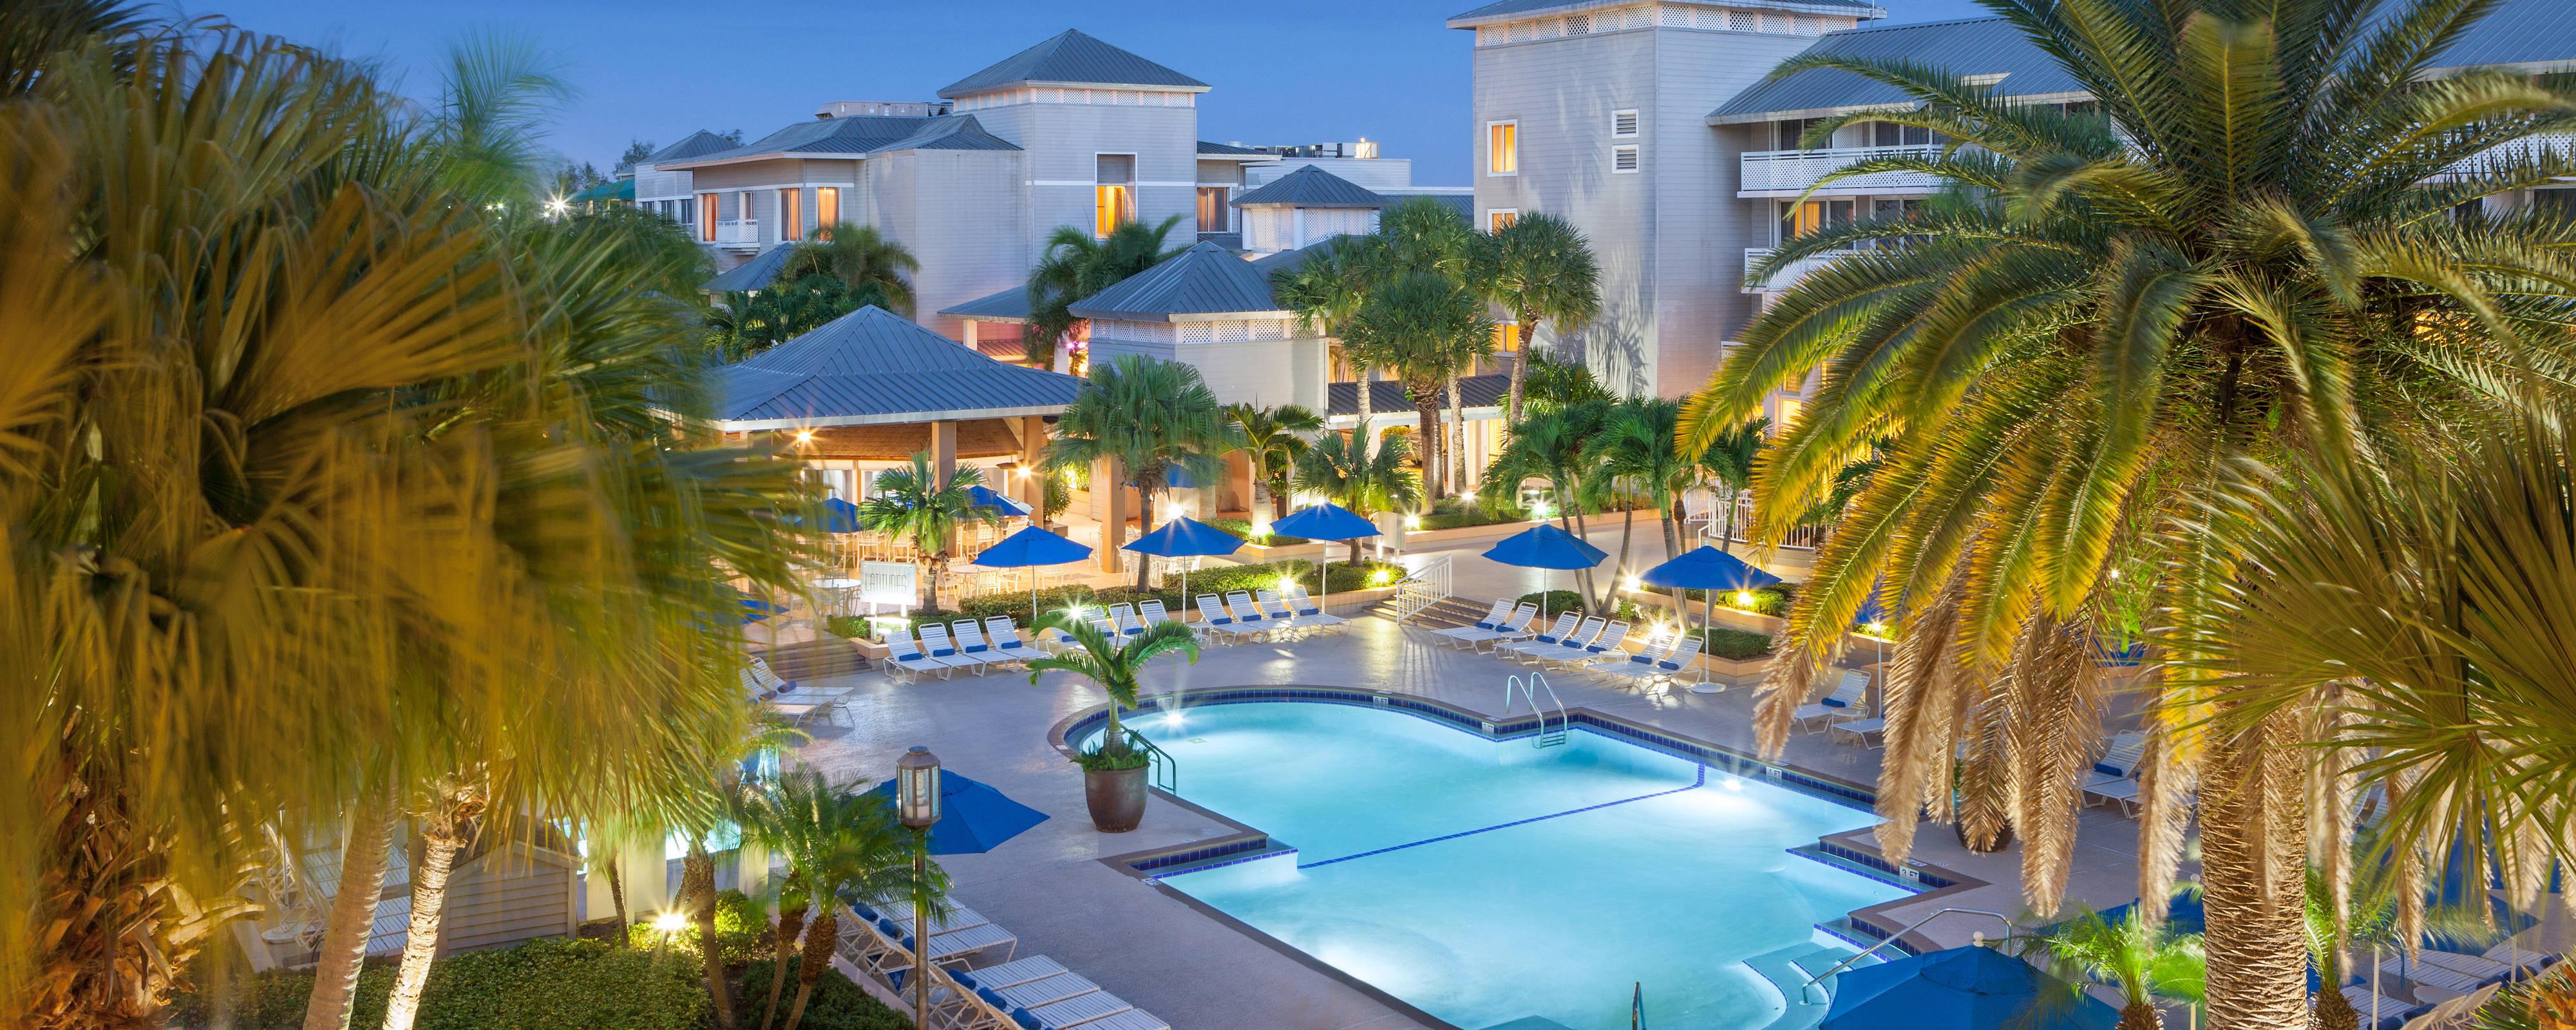 Hutchinson Island Hotel | Hutchinson Island Marriott Beach Resort - Hutchinson Island Florida Map